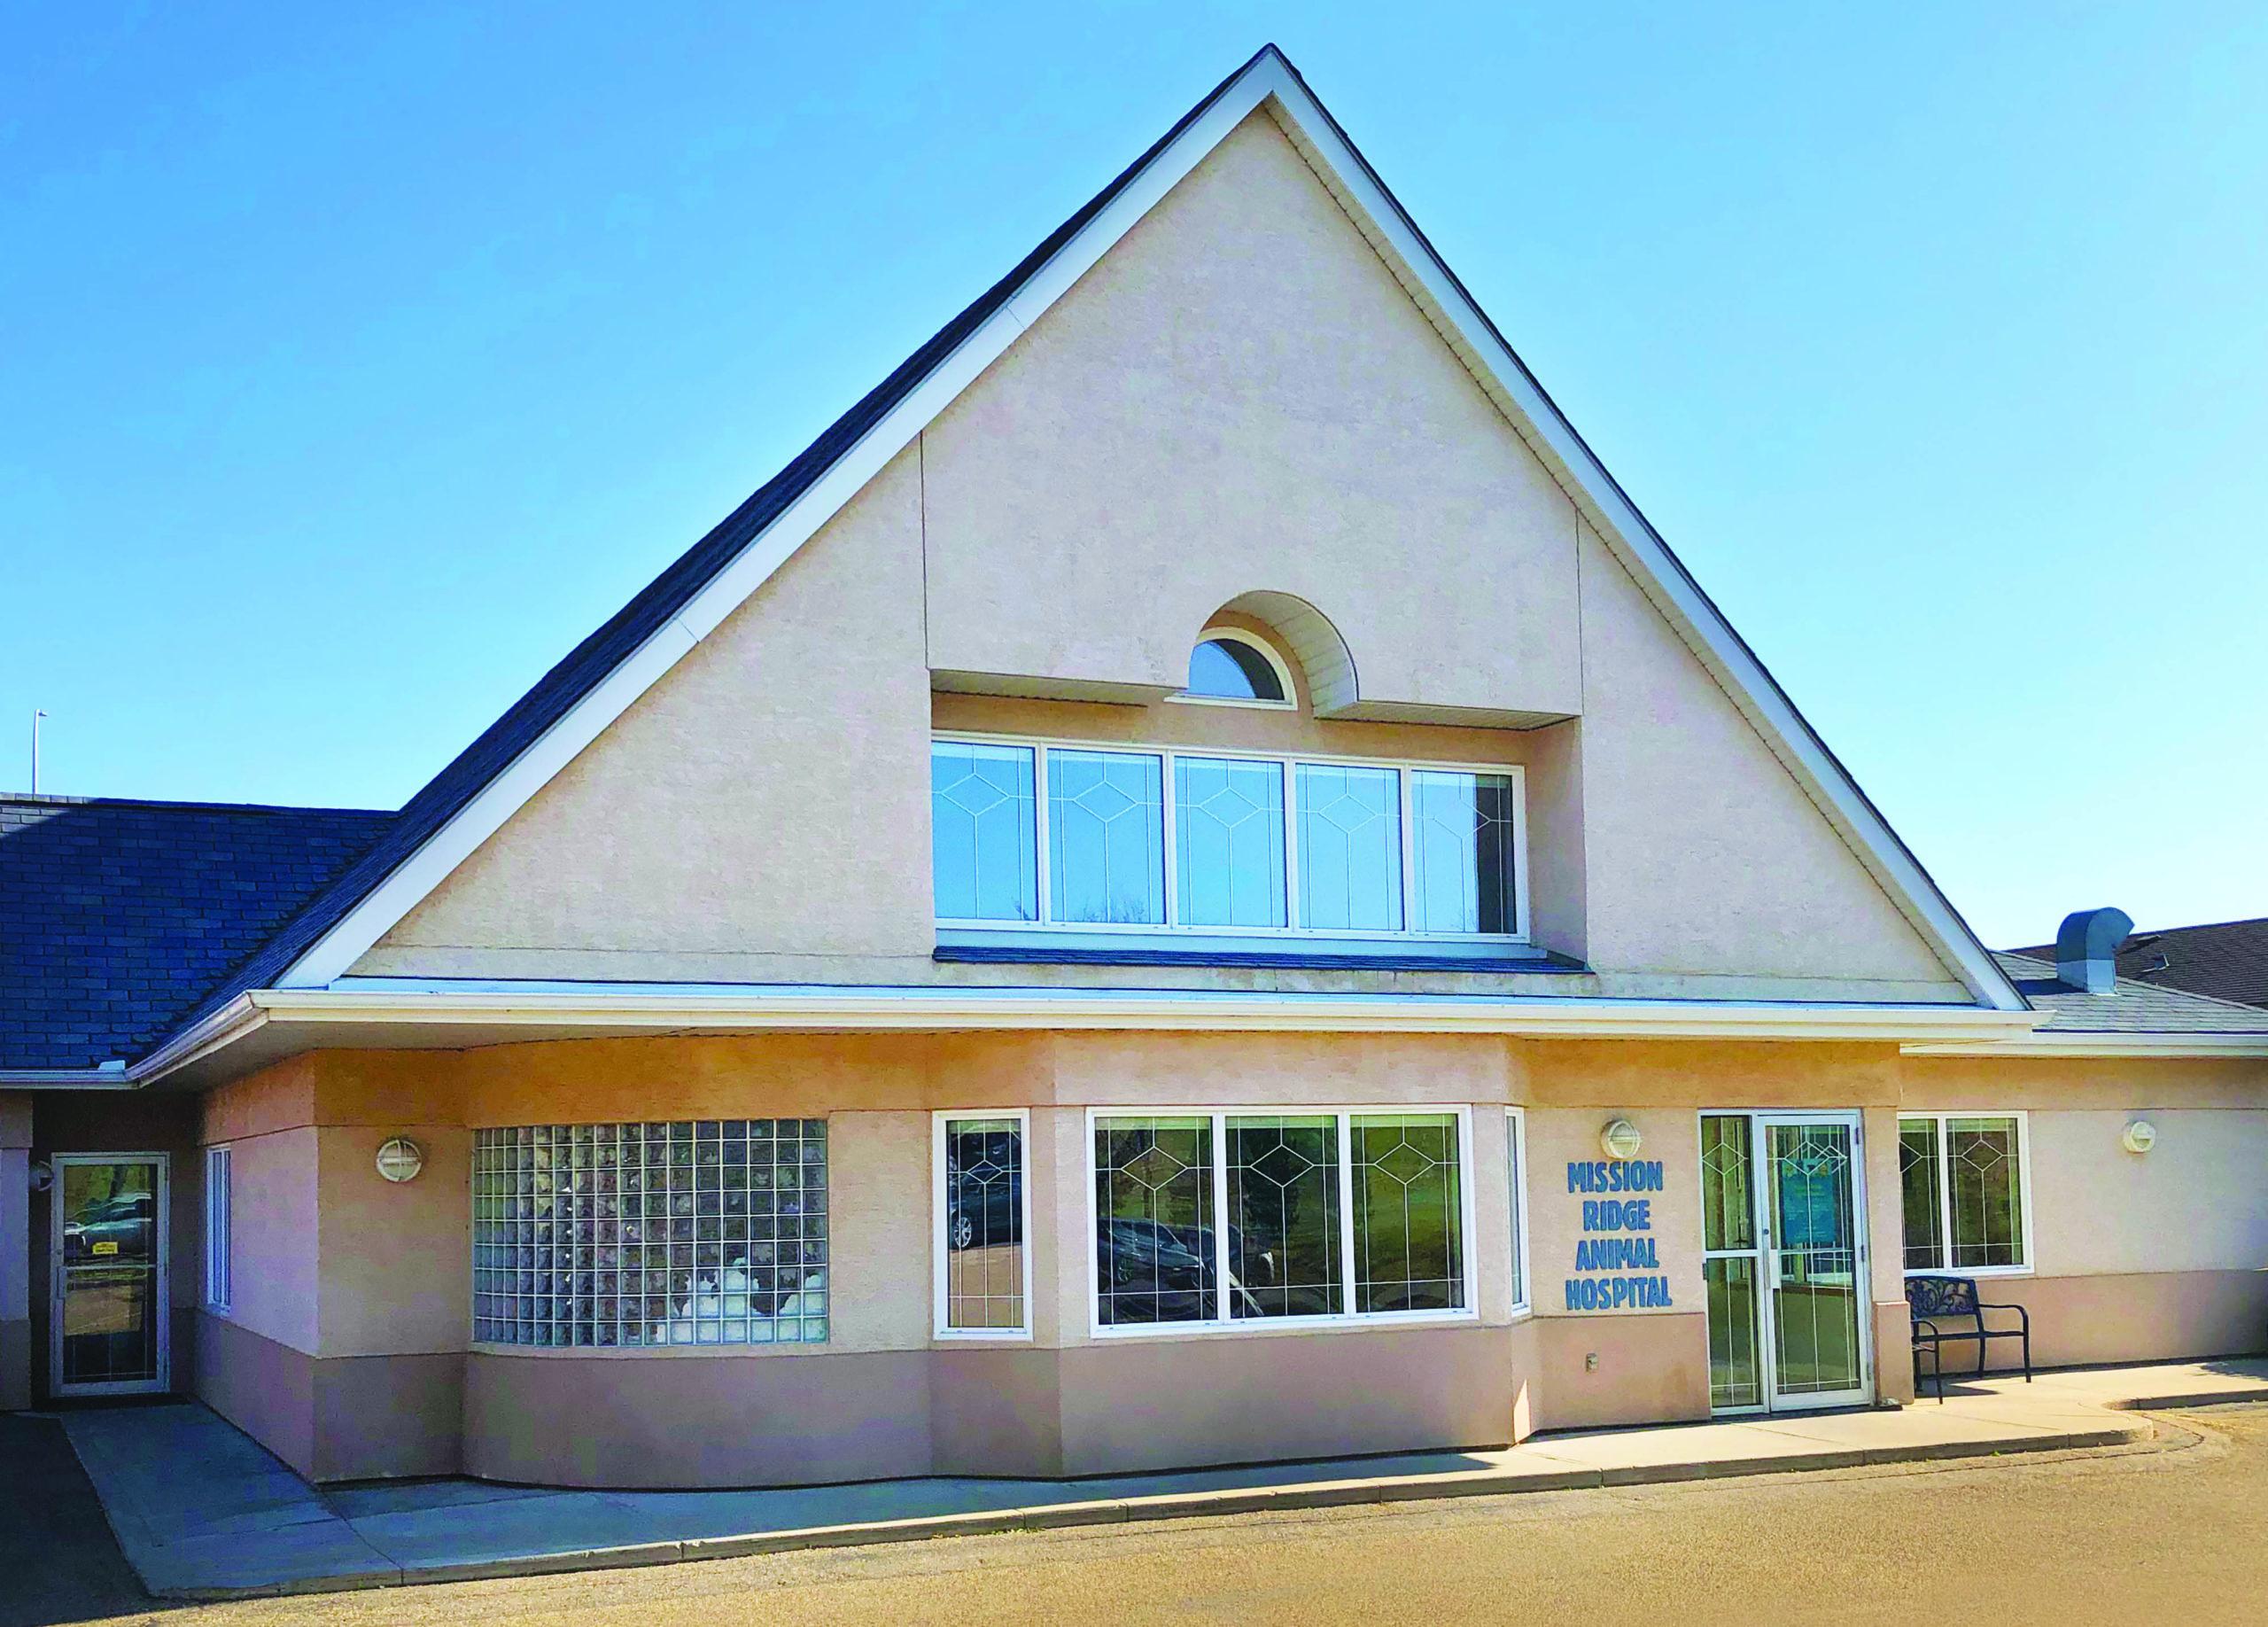 Building exterior of Mission Ridge Animal Hospital